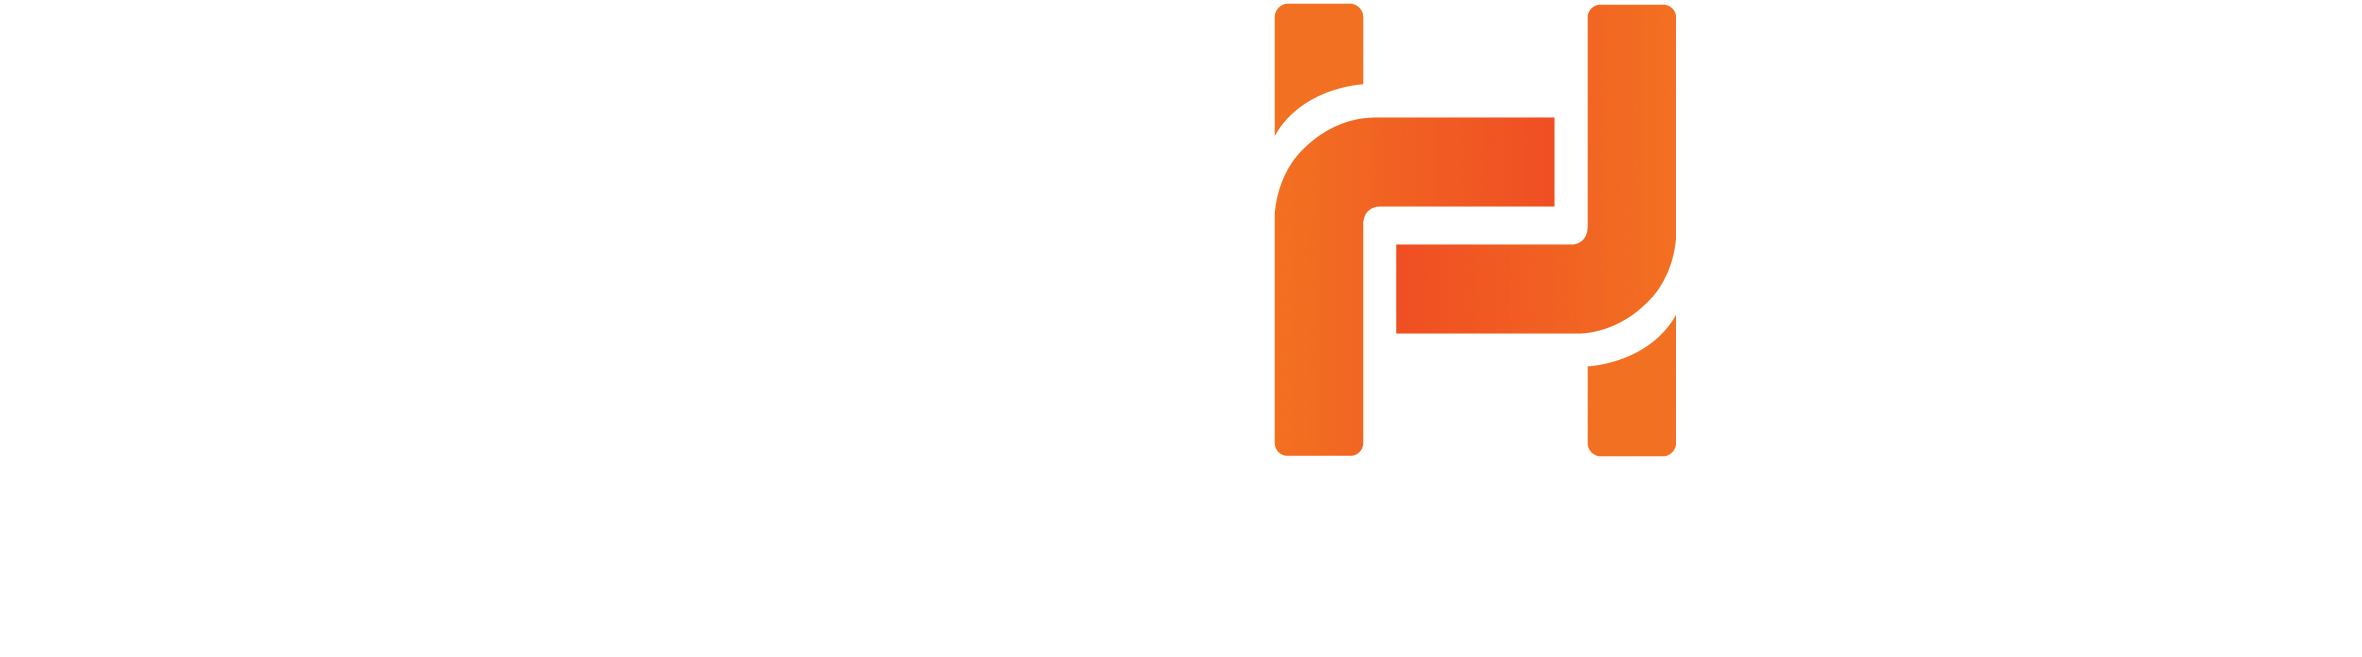 remiisrael-design-ccah-logo.png